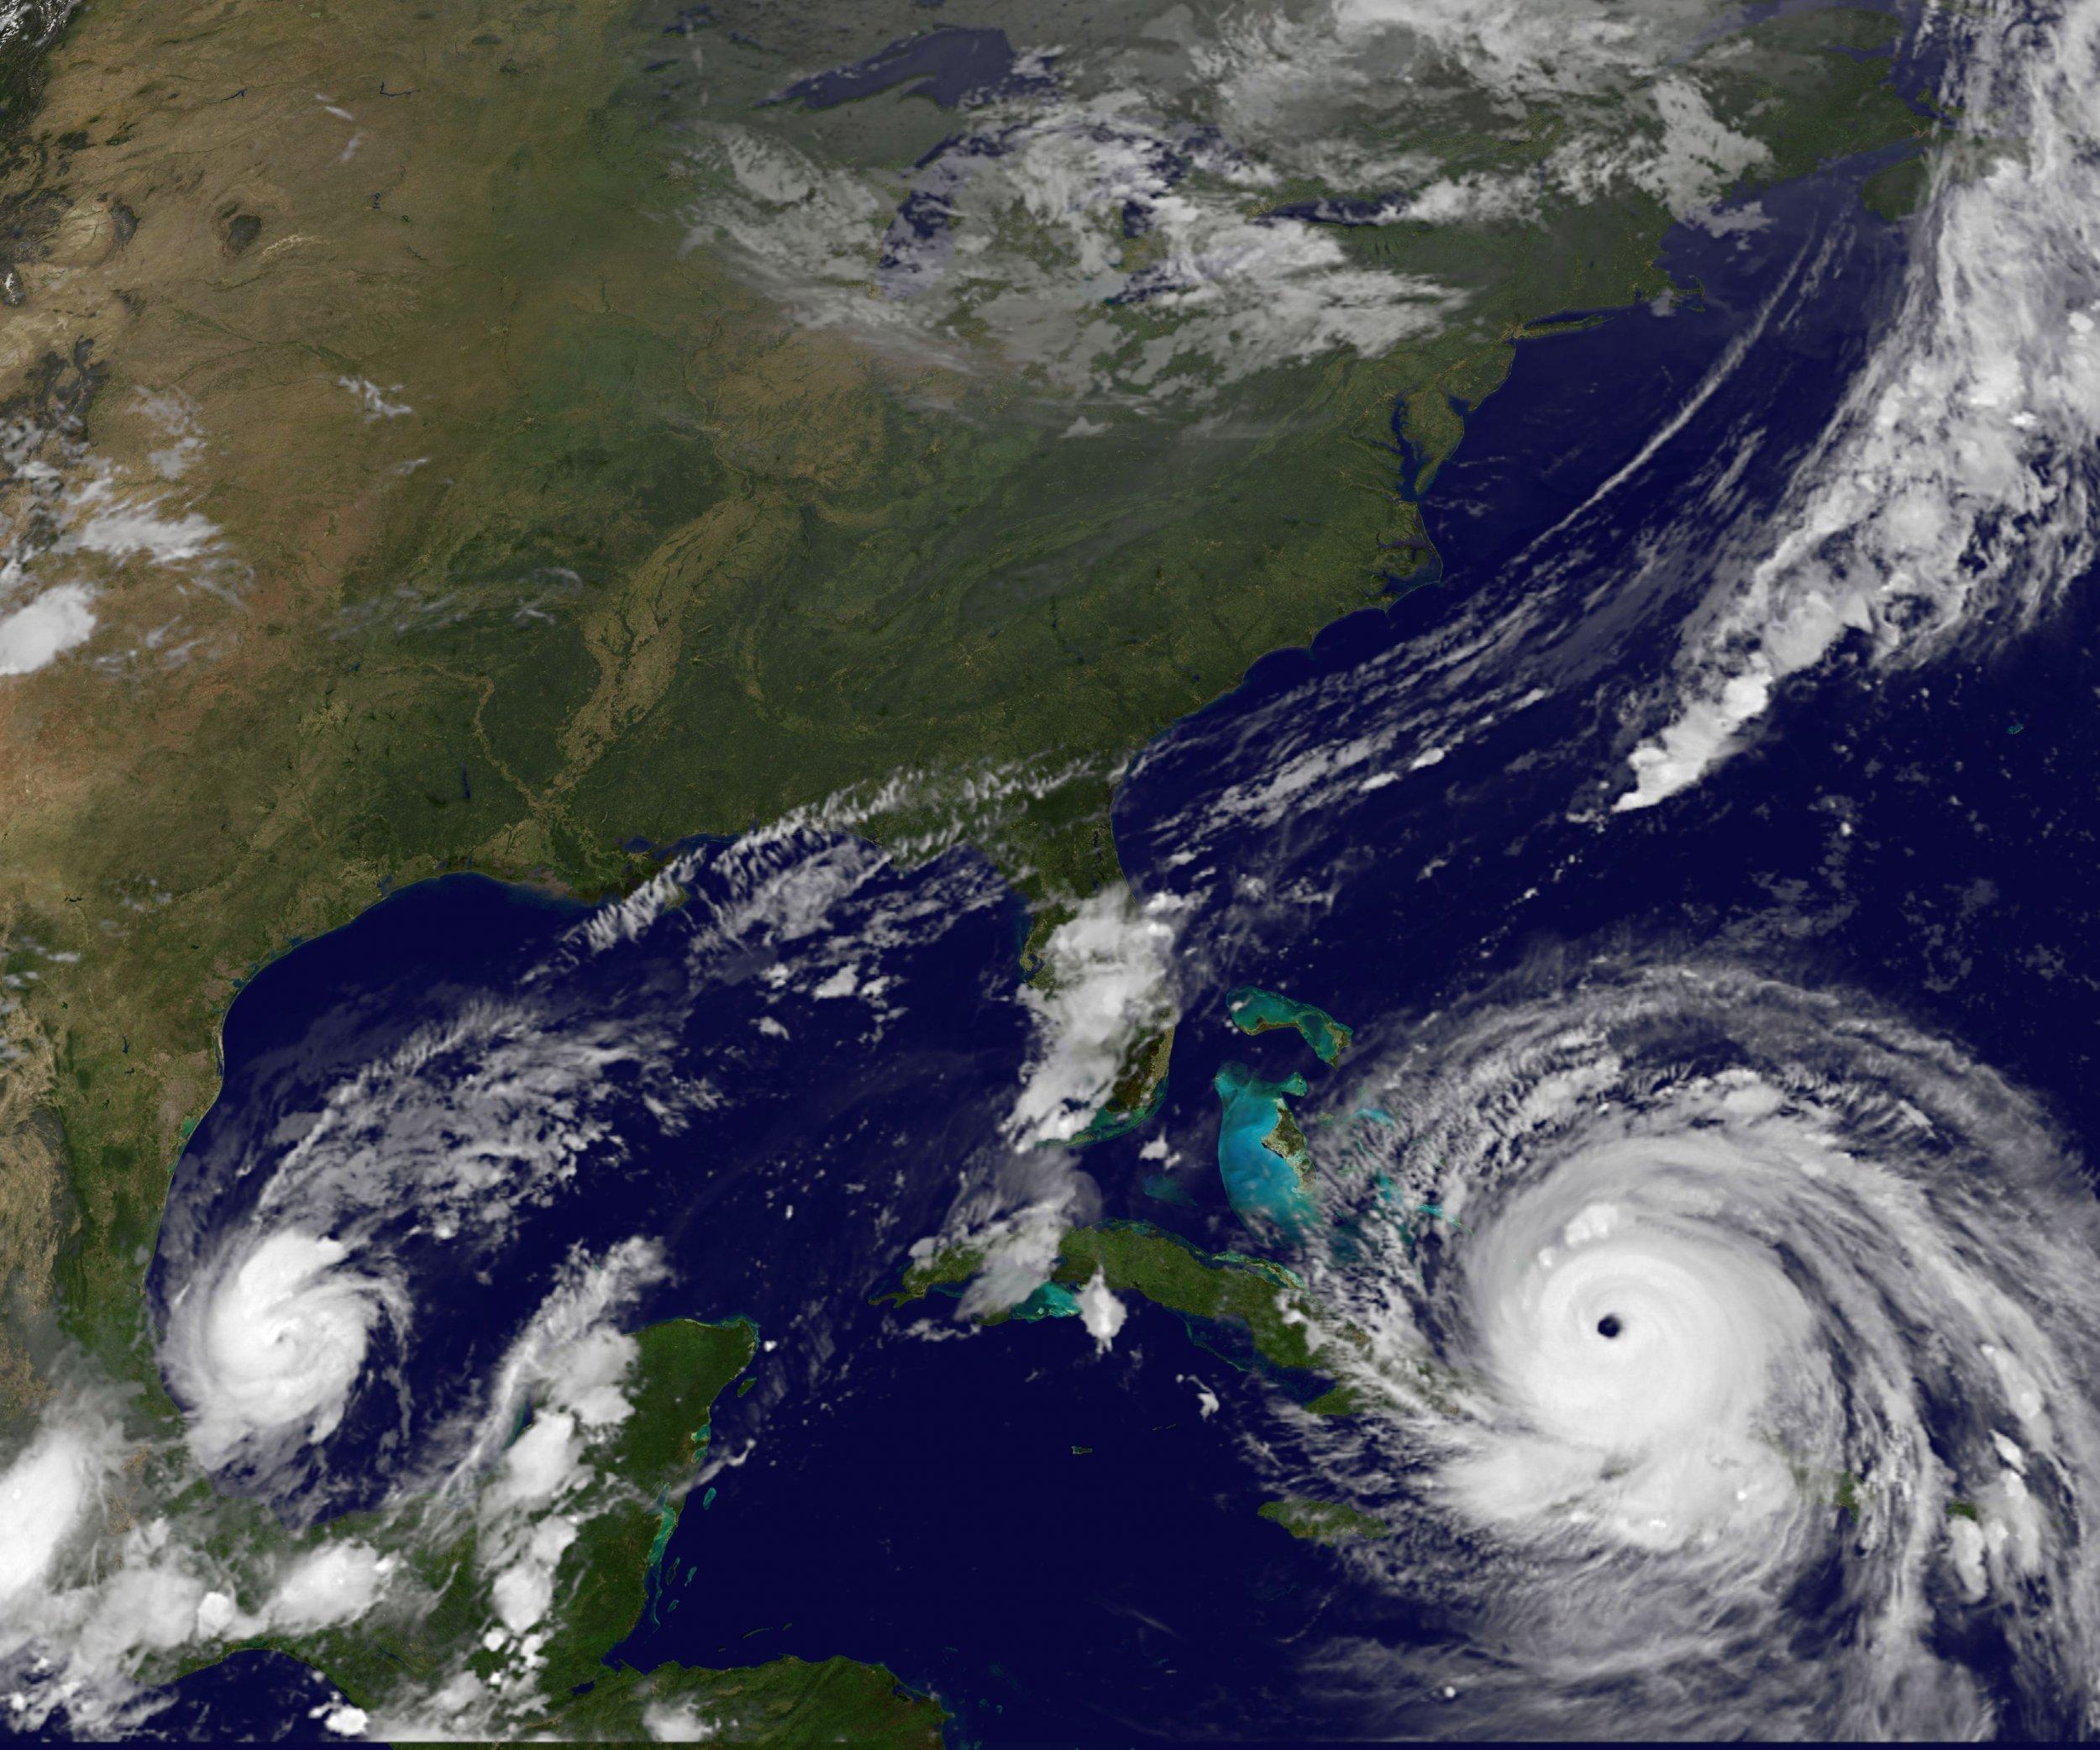 Category: Hurricane Irma As It Happened: Category 5 Storm Hits Cuba